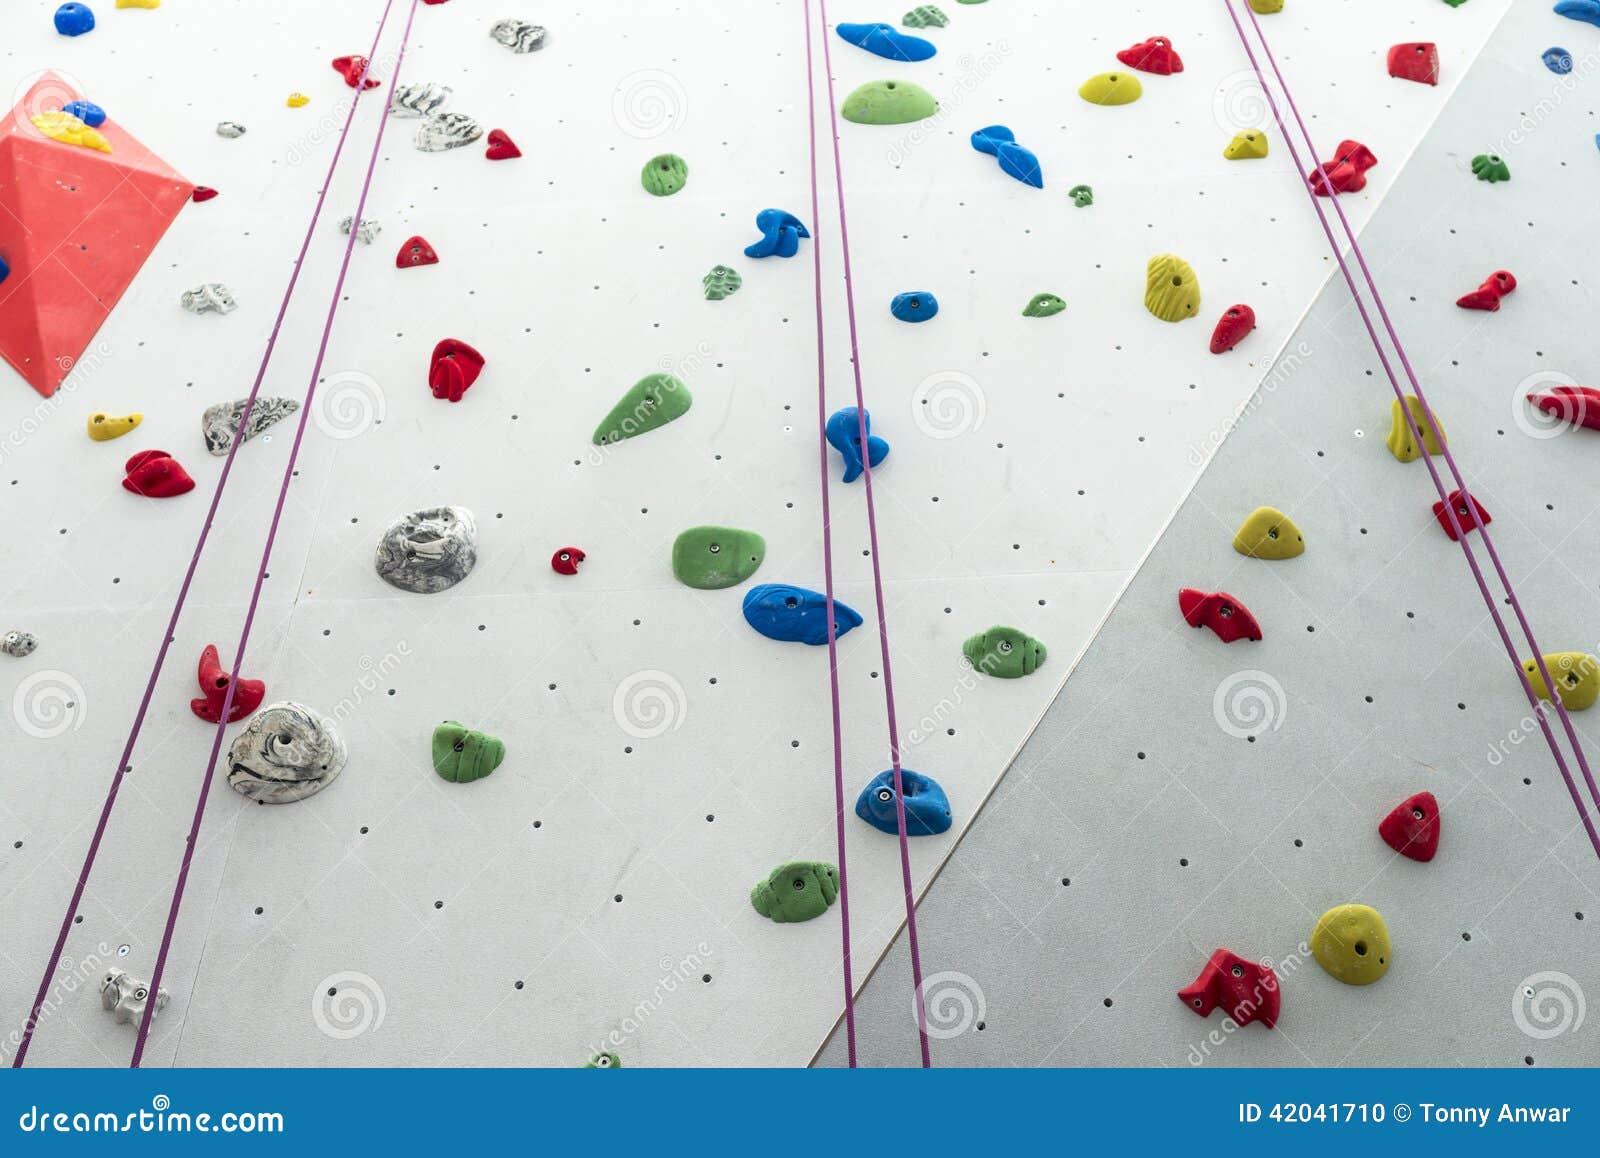 Rock climbing wall cartoon